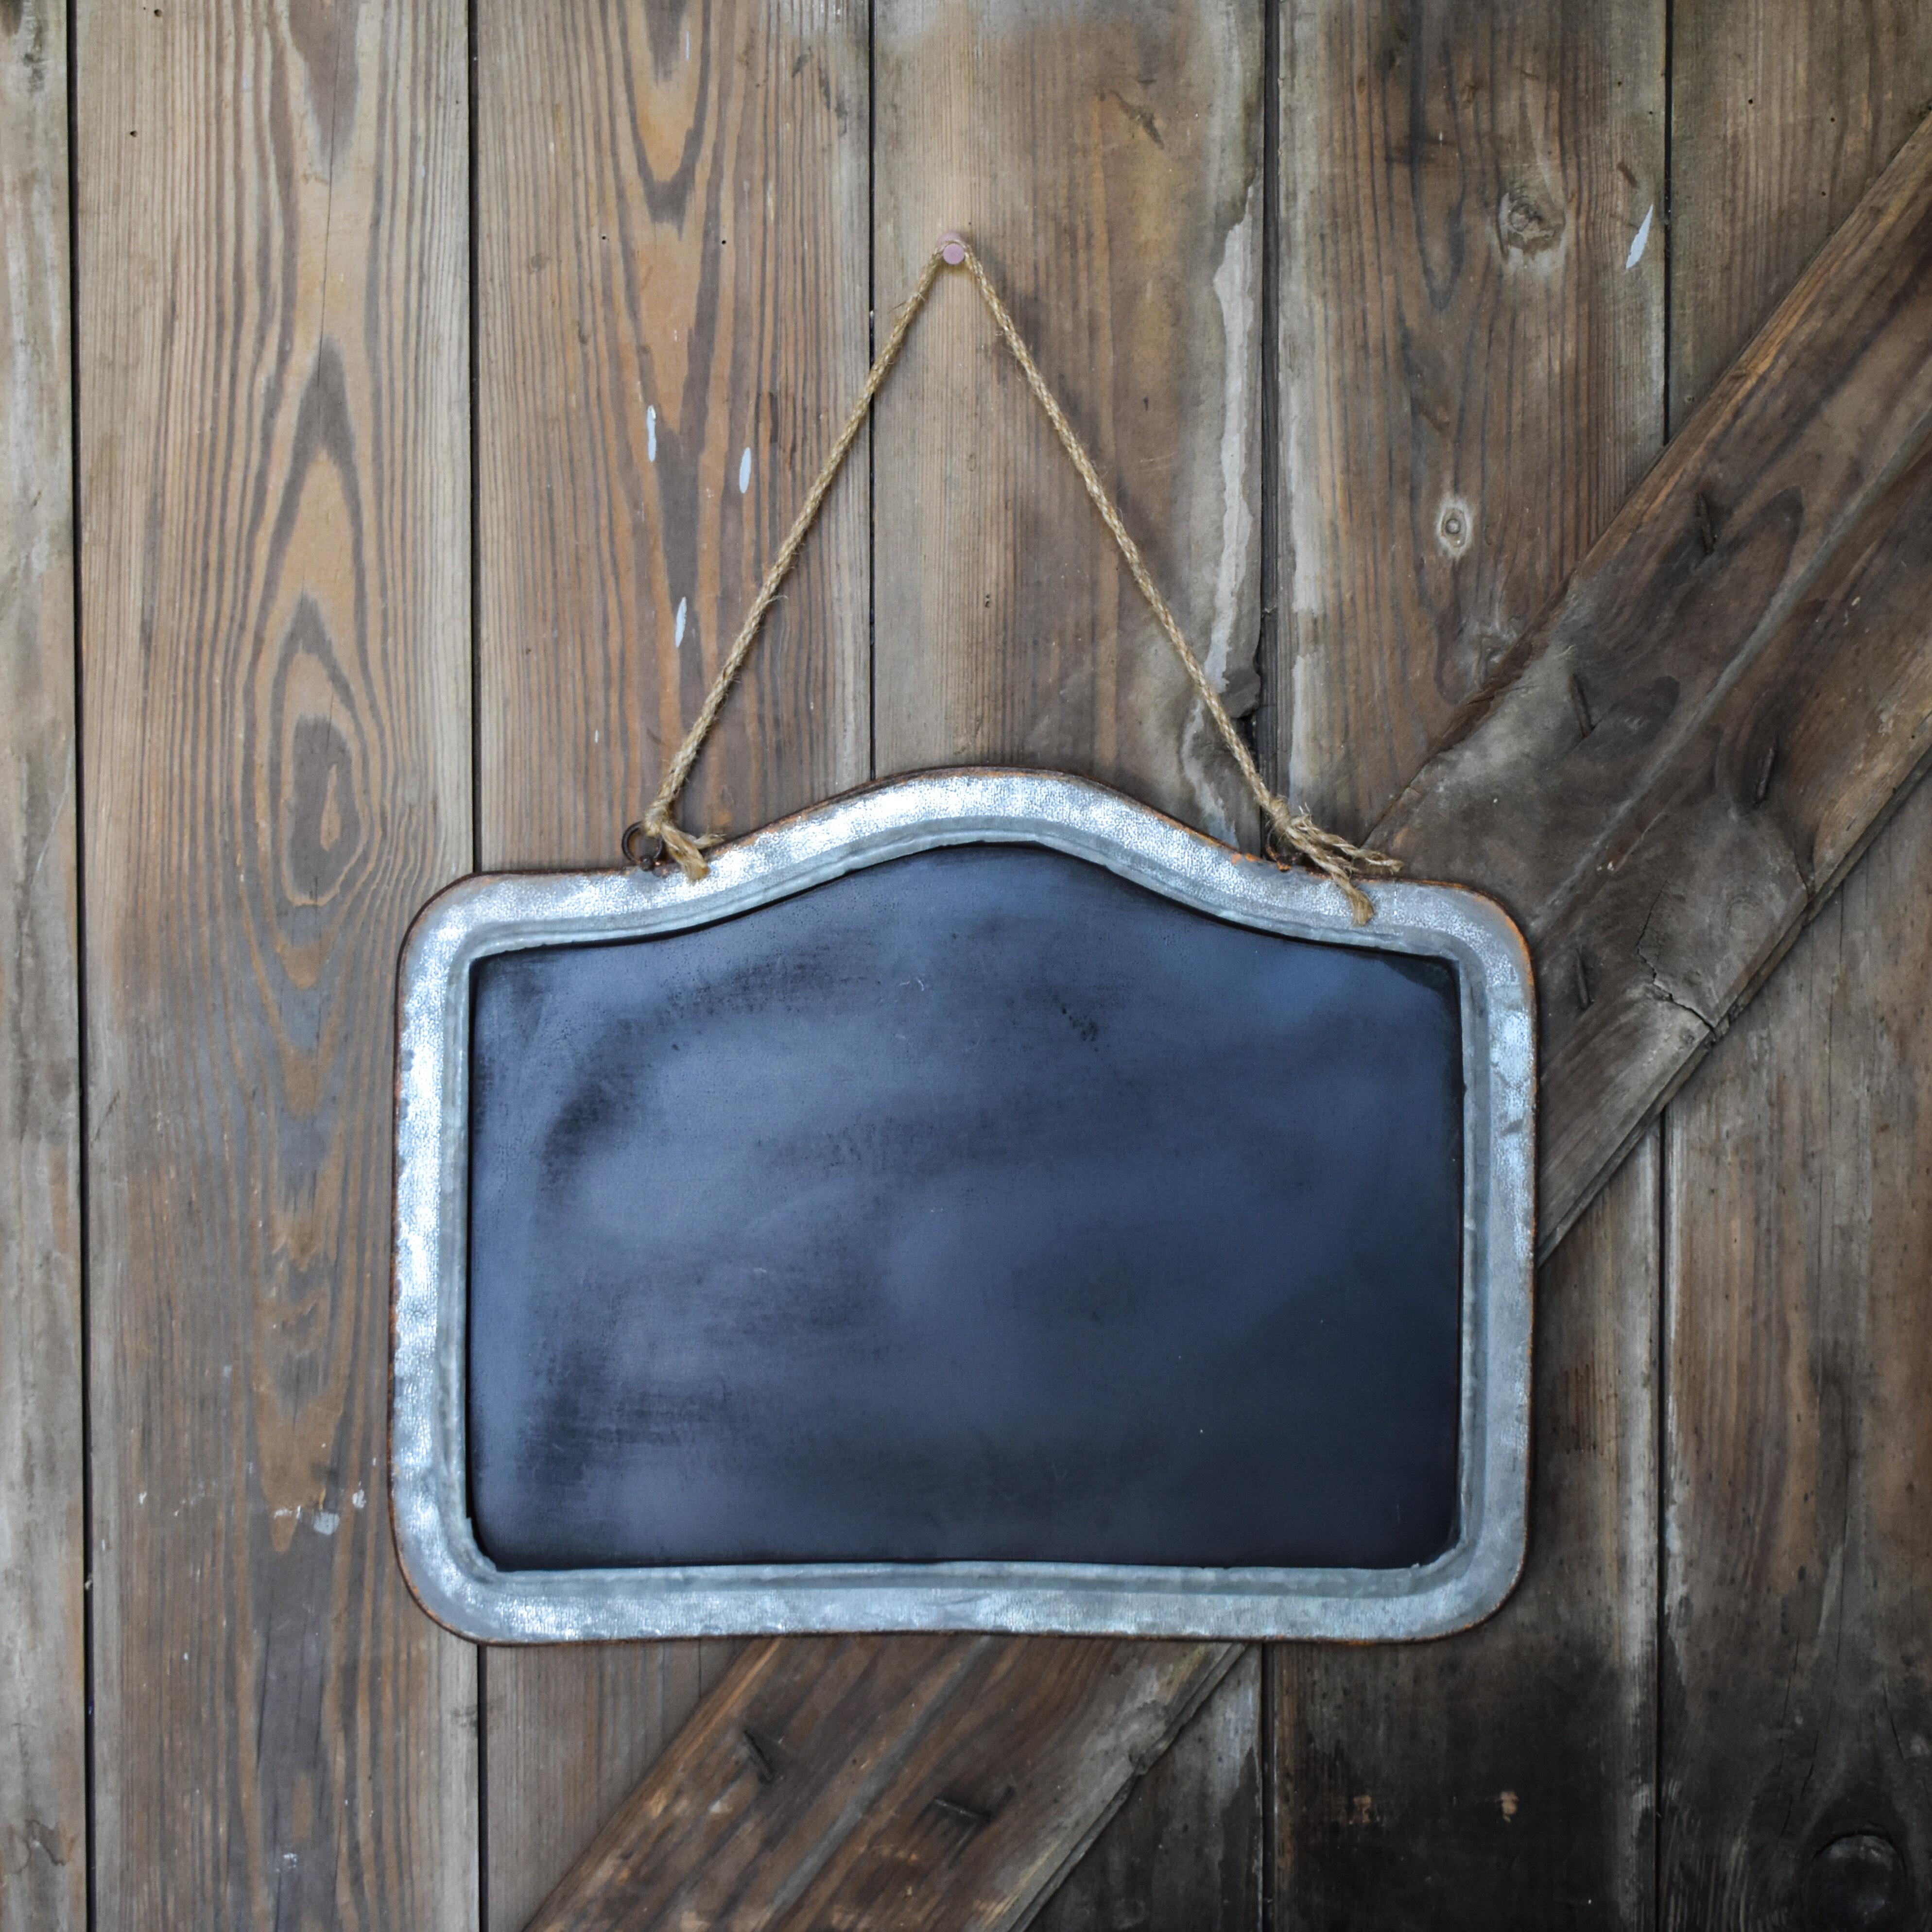 Laurel Foundry Modern Farmhouse LG Wall Mounted Chalkboard | Wayfair